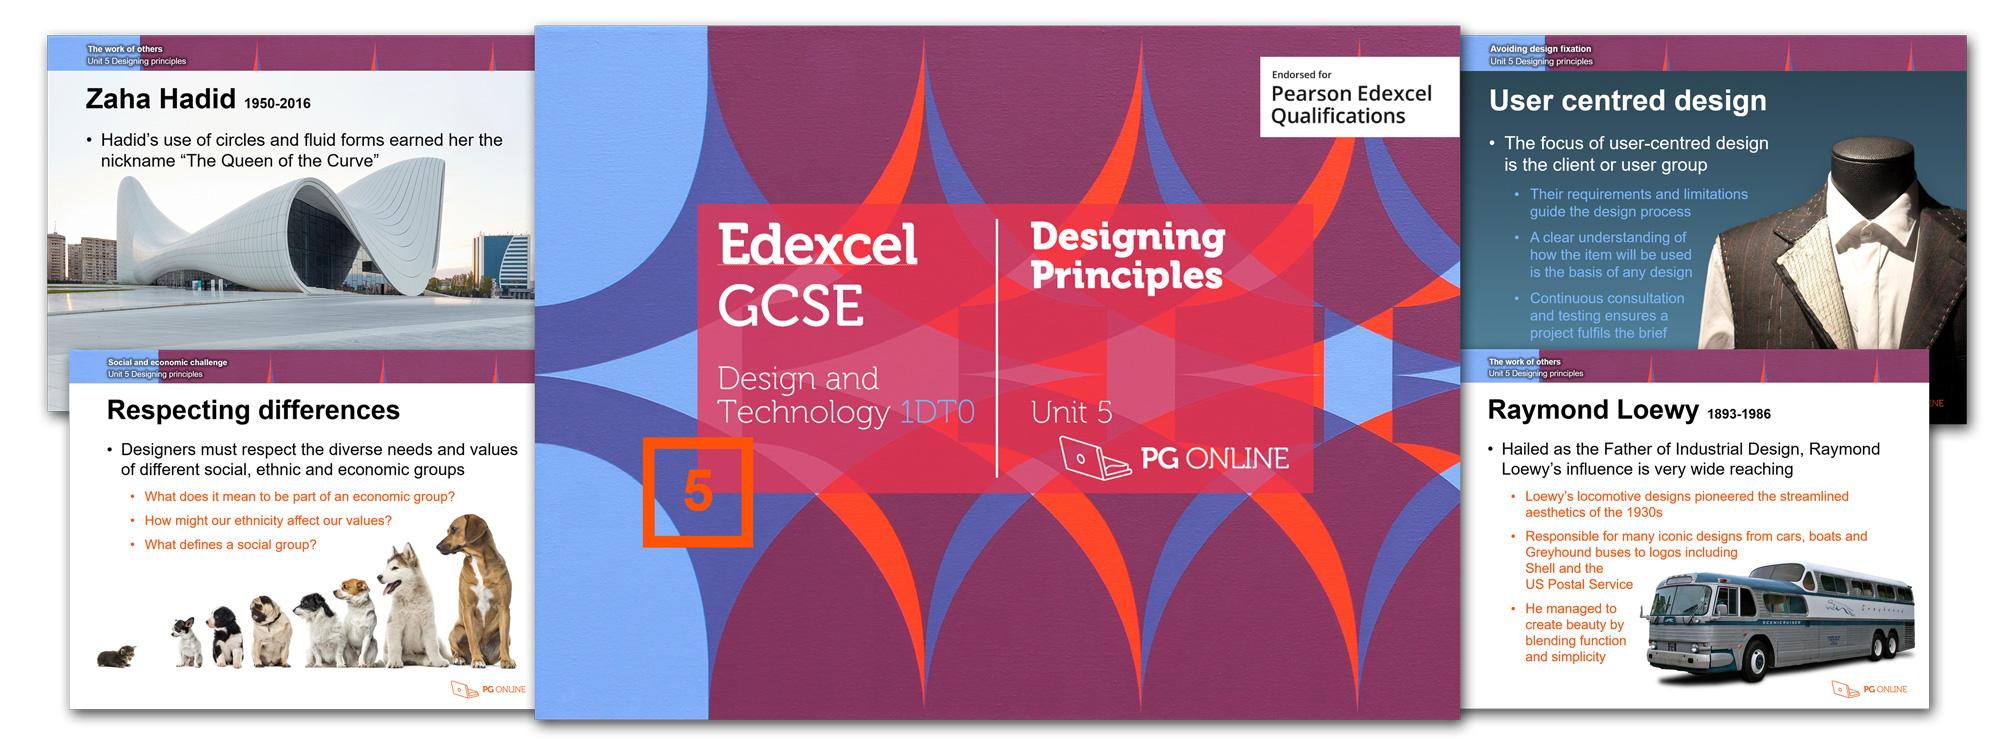 edexcel s1 textbook pdf free download